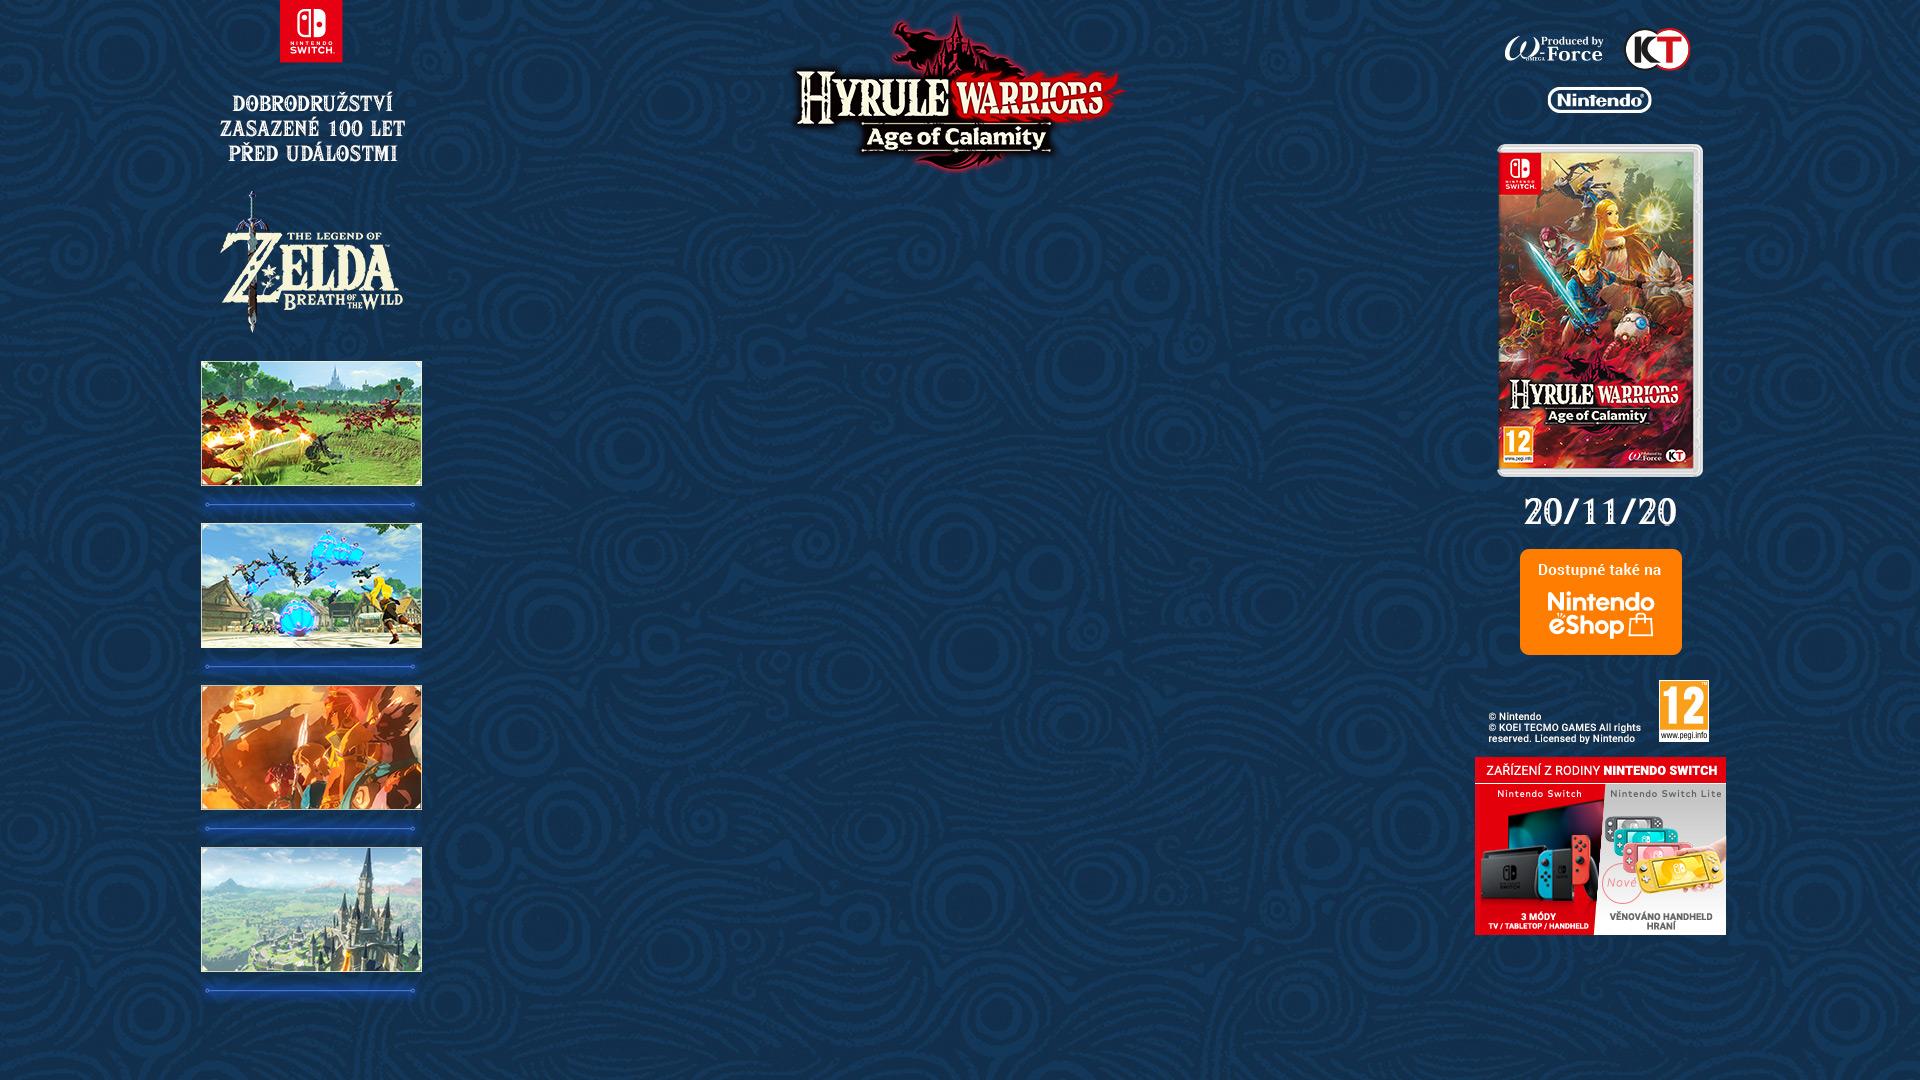 NINTENDOSHOP SWITCH Hyrule Warriors: Age of Calamity